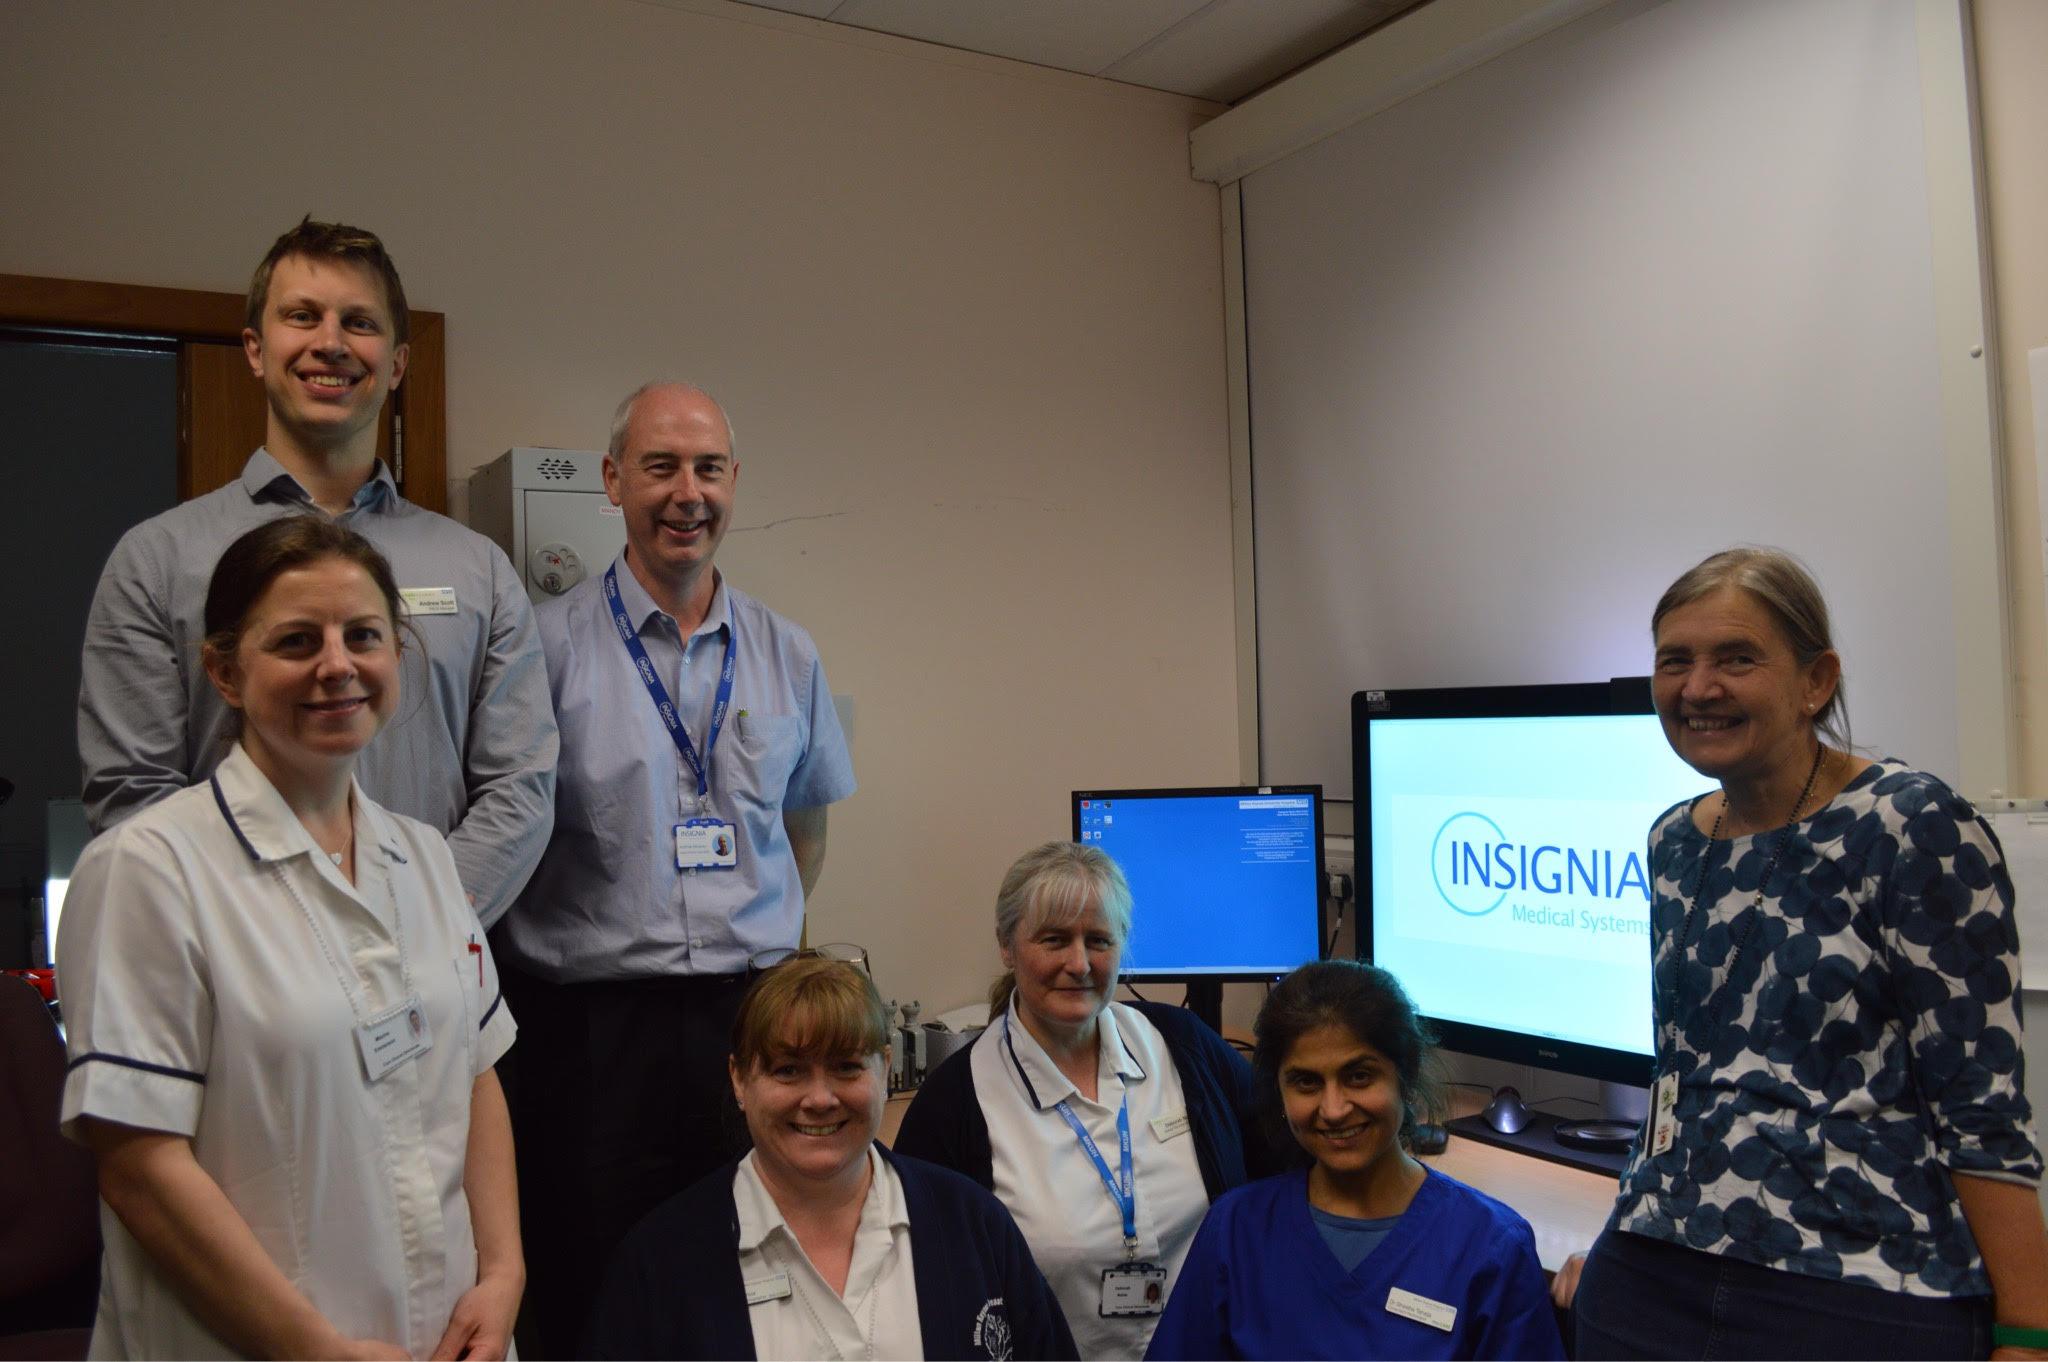 Milton Keynes and Insignia Medical Systems.jpg